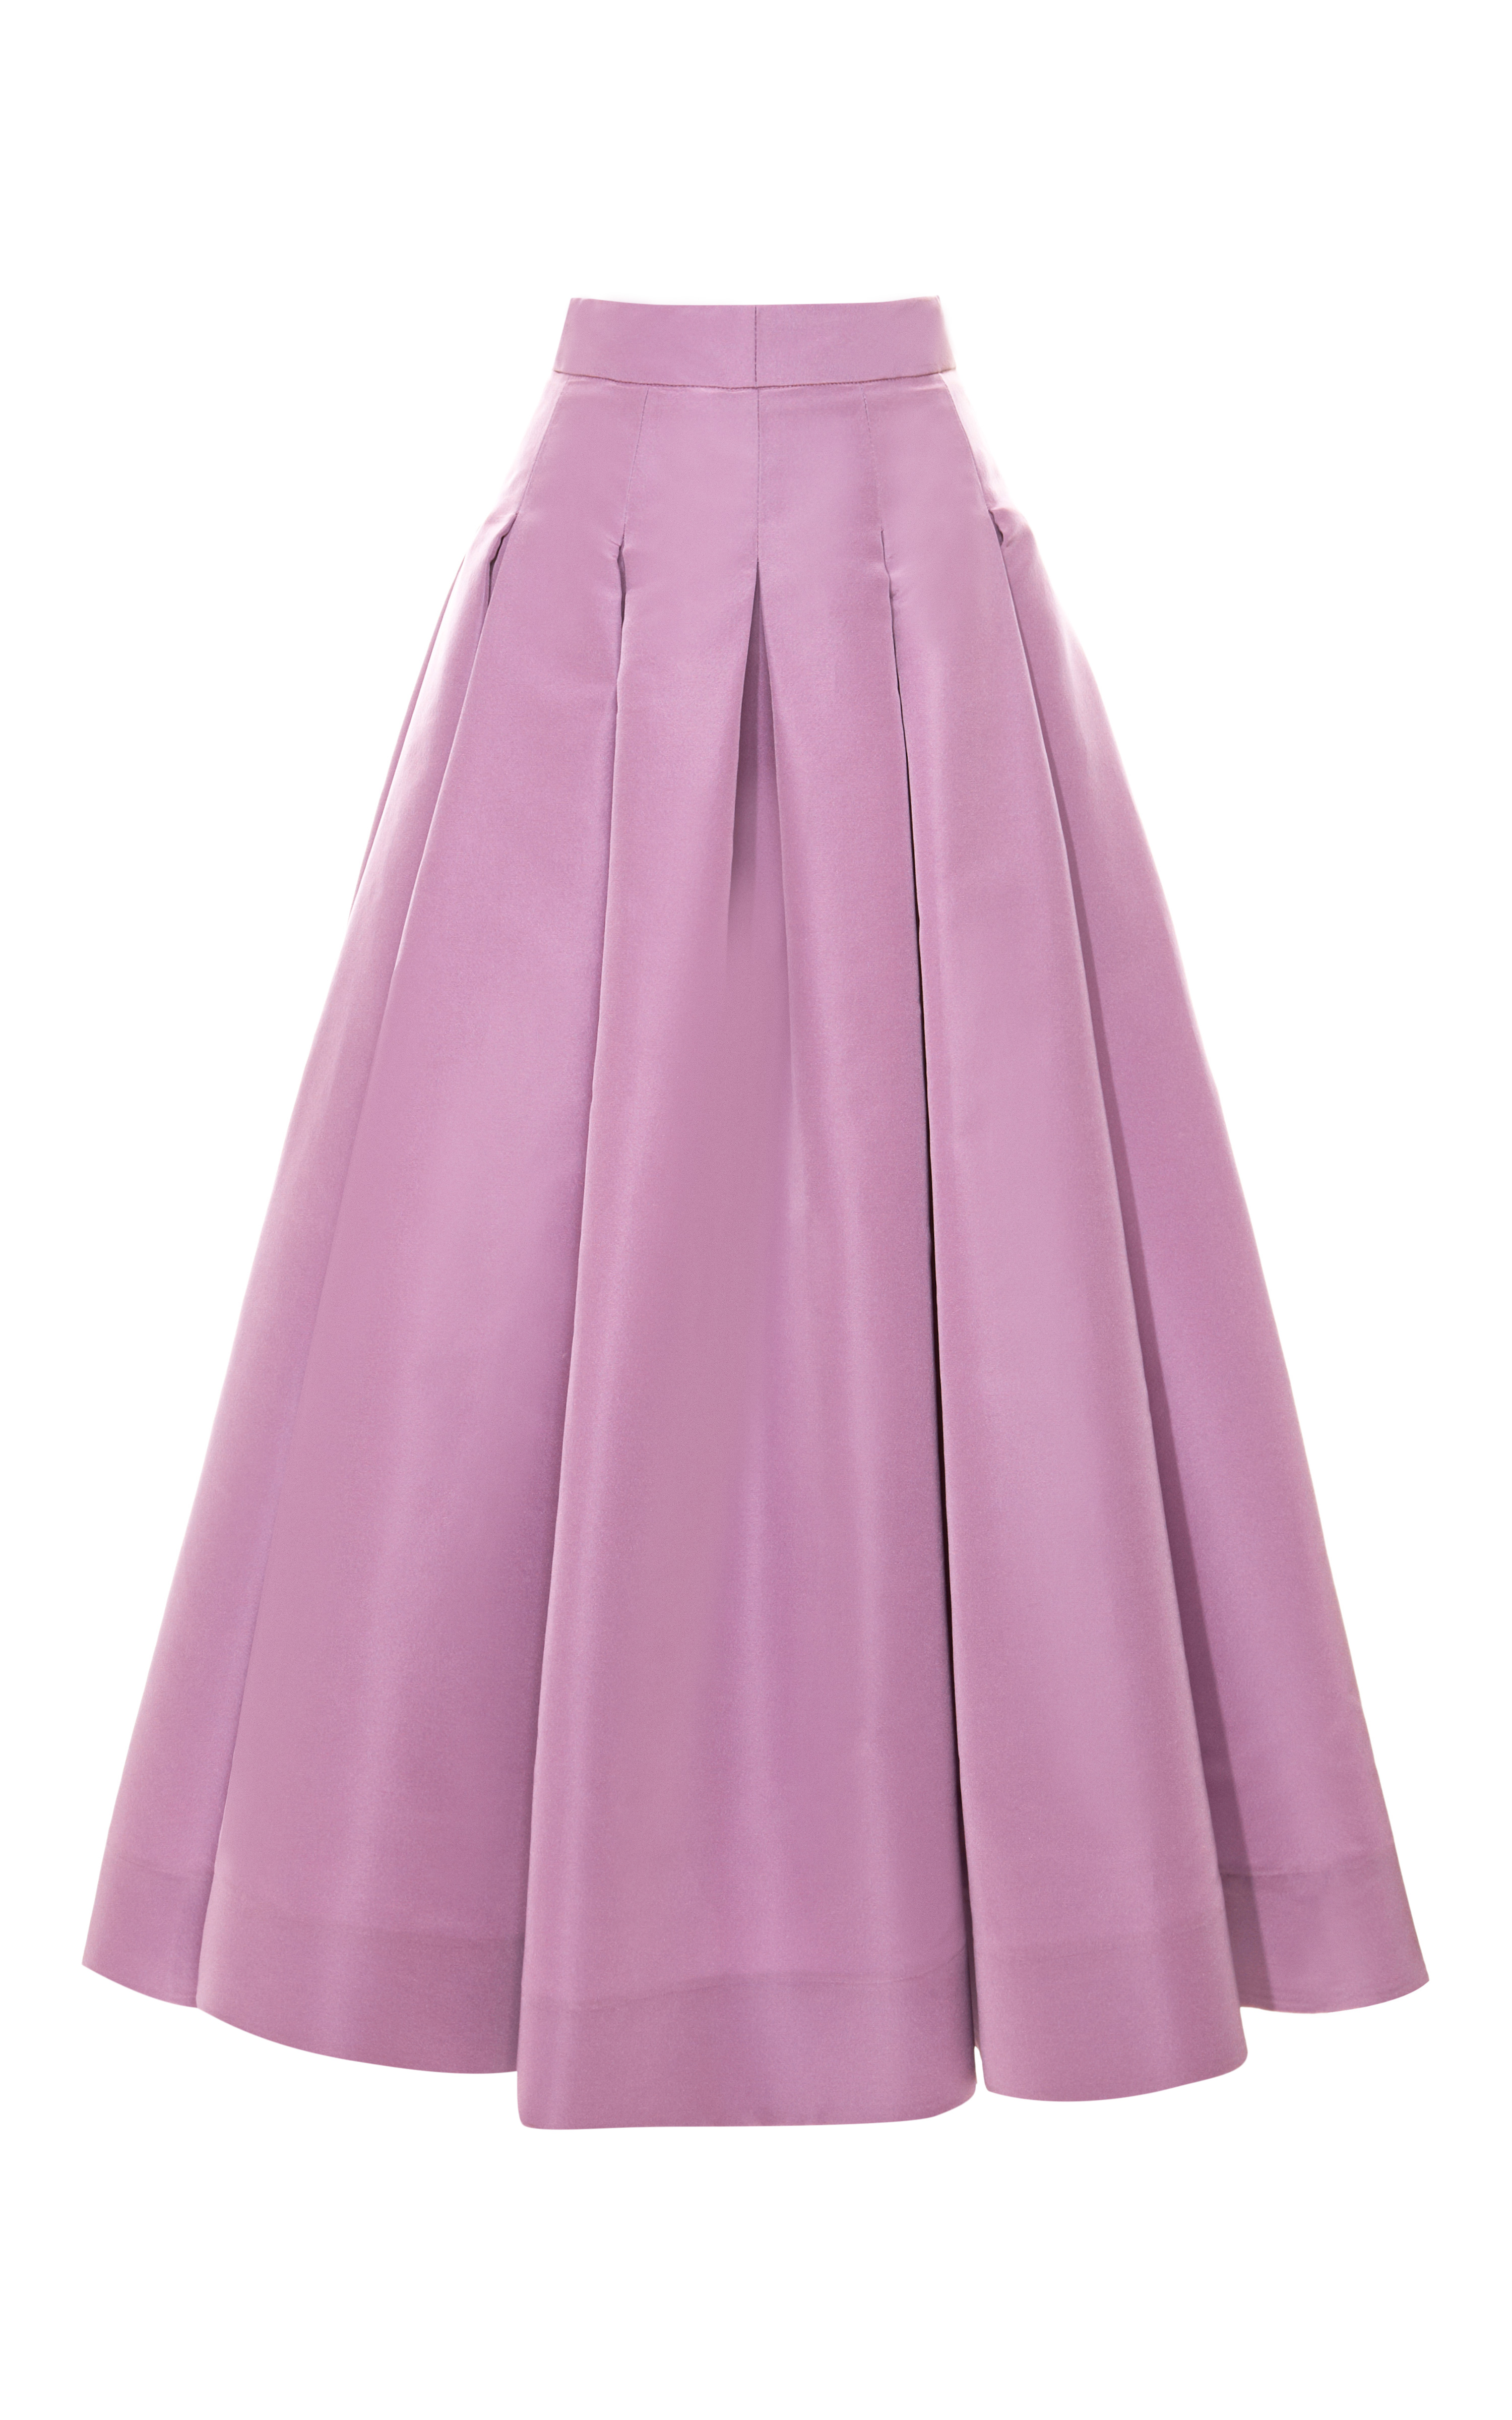 ermilio box pleat swing skirt in purple lilac lyst